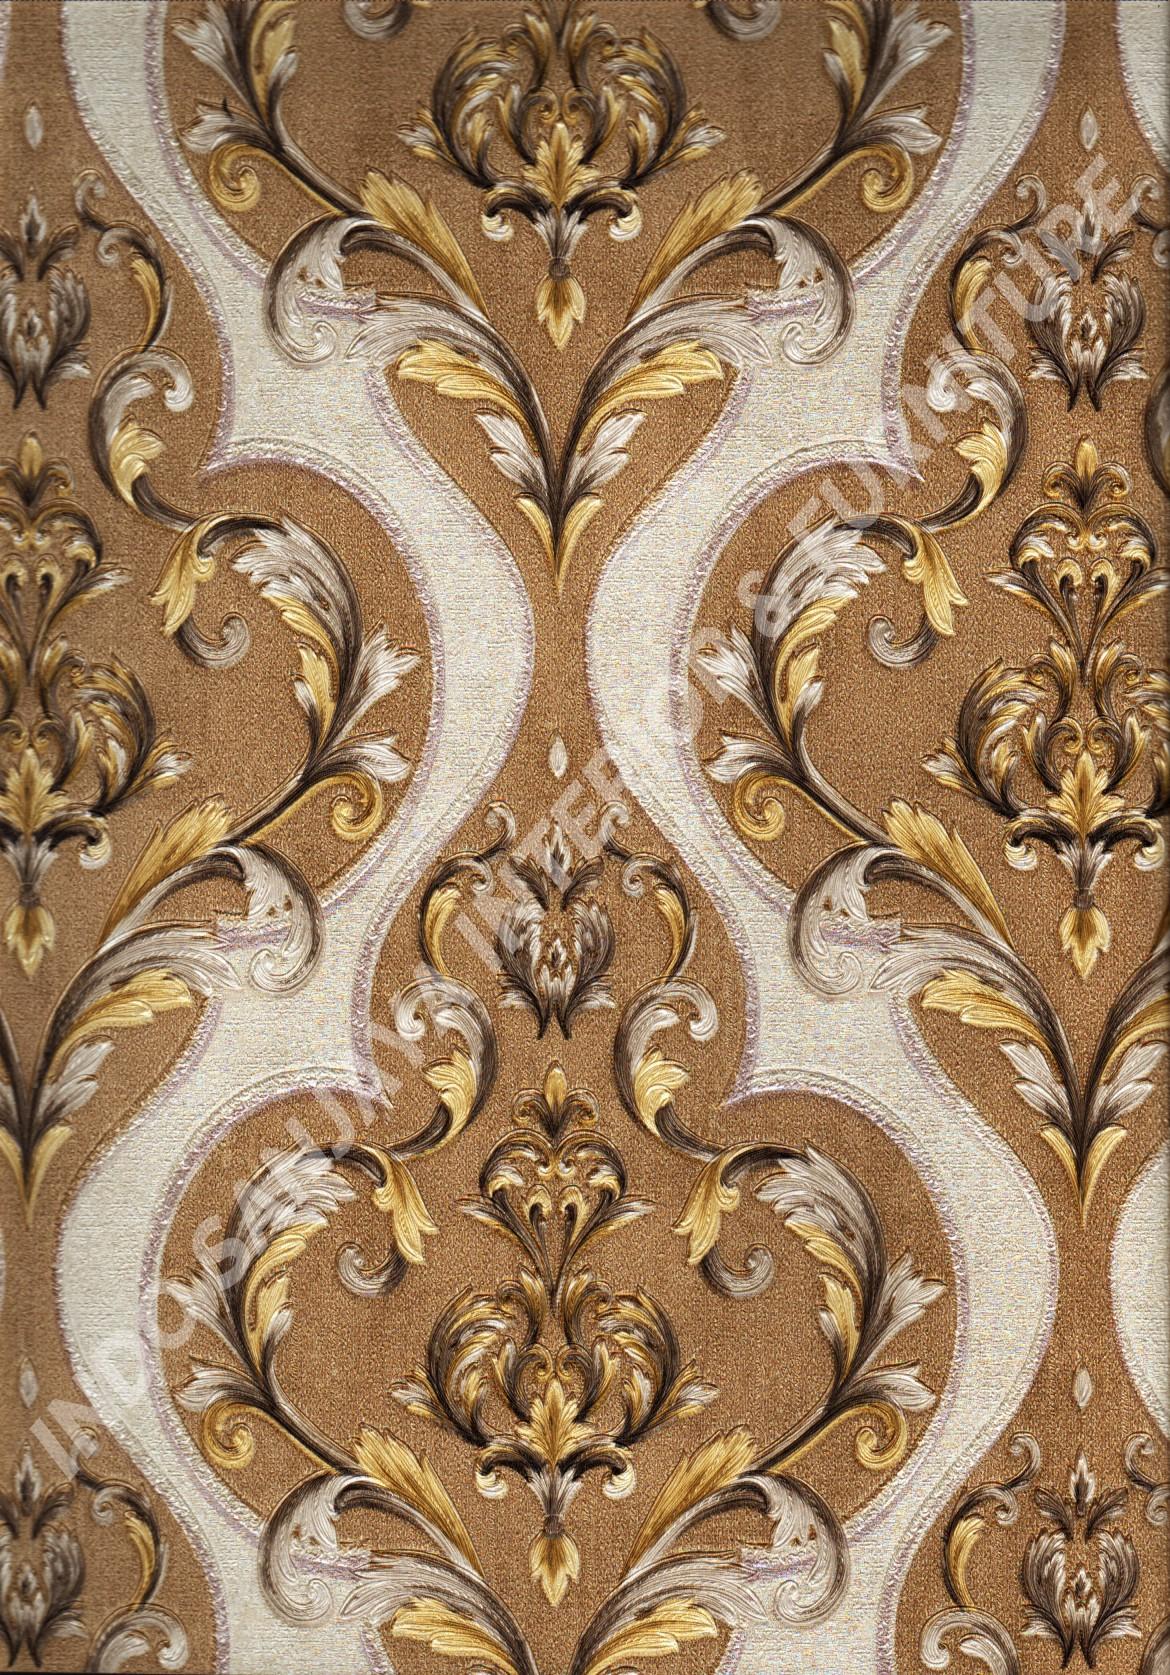 wallpaper   Wallpaper Klasik Batik (Damask) YG71105:YG71105 corak  warna